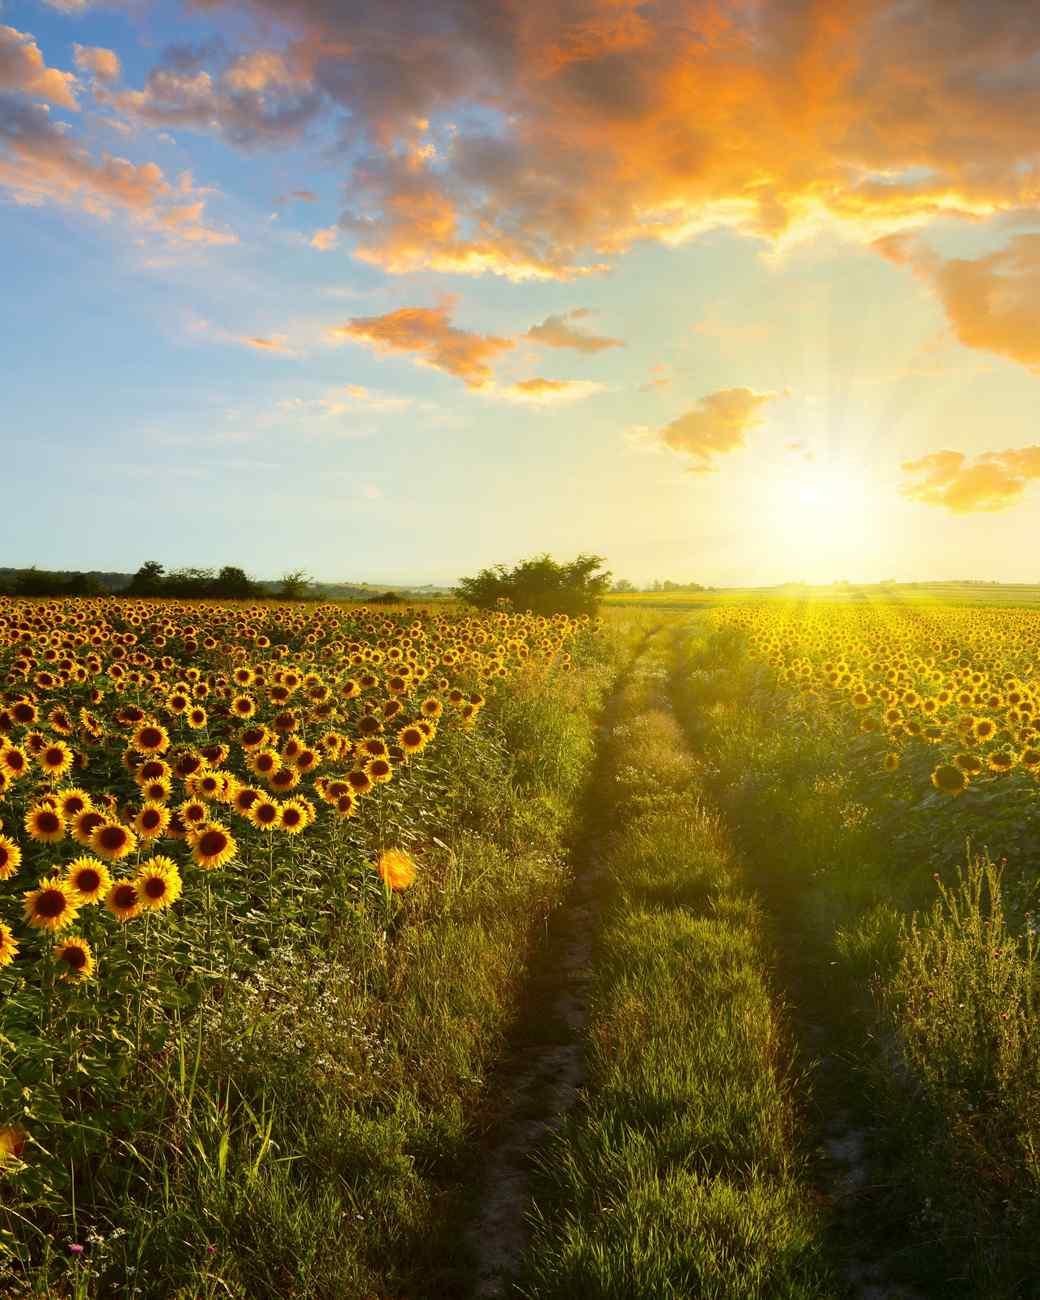 sunflower fields in Sussex County, New Jersey